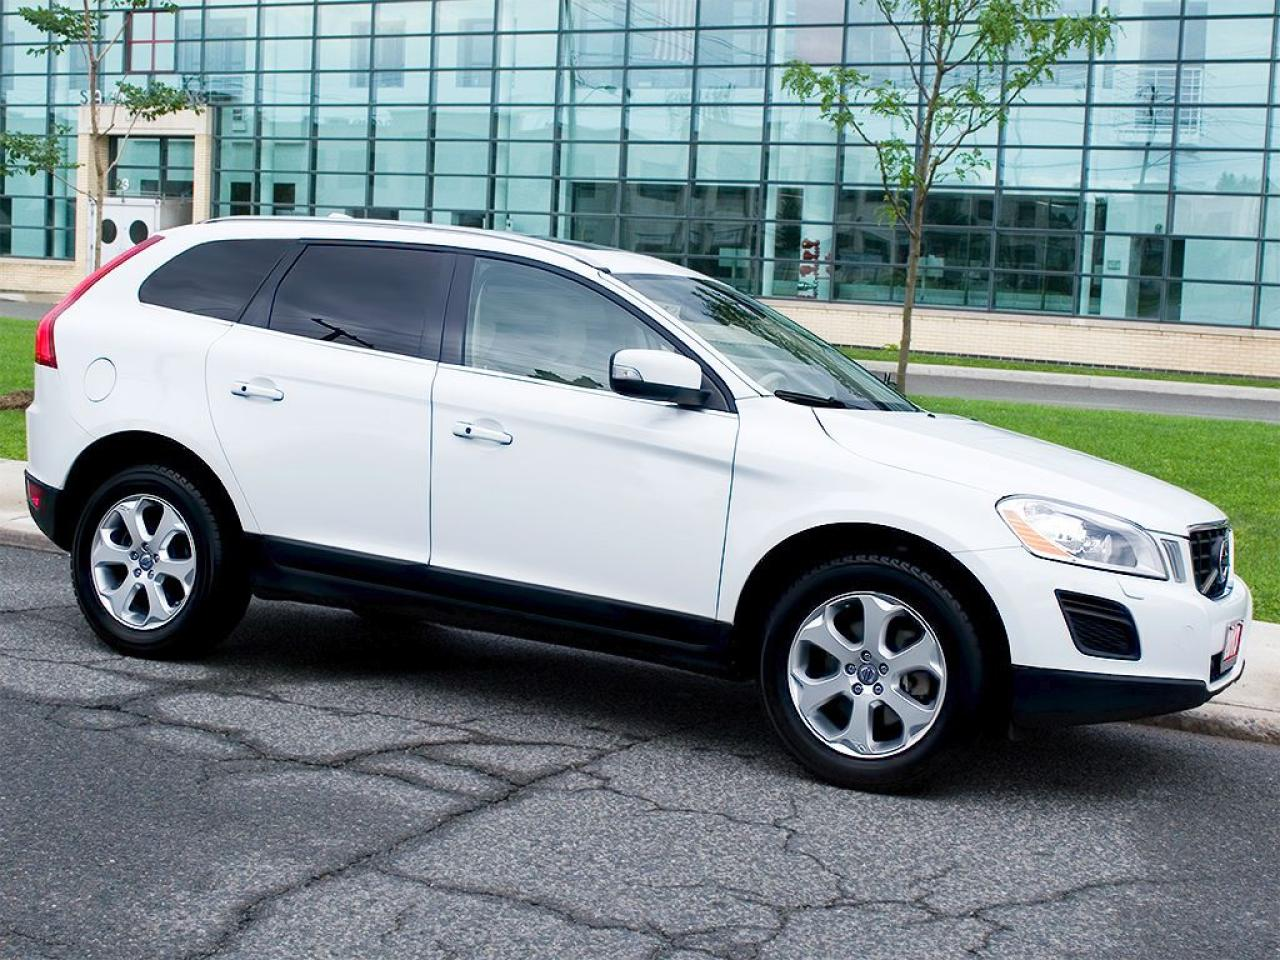 2013 Volvo XC60 AWD|NAVI|REARCAM|PANOROOF